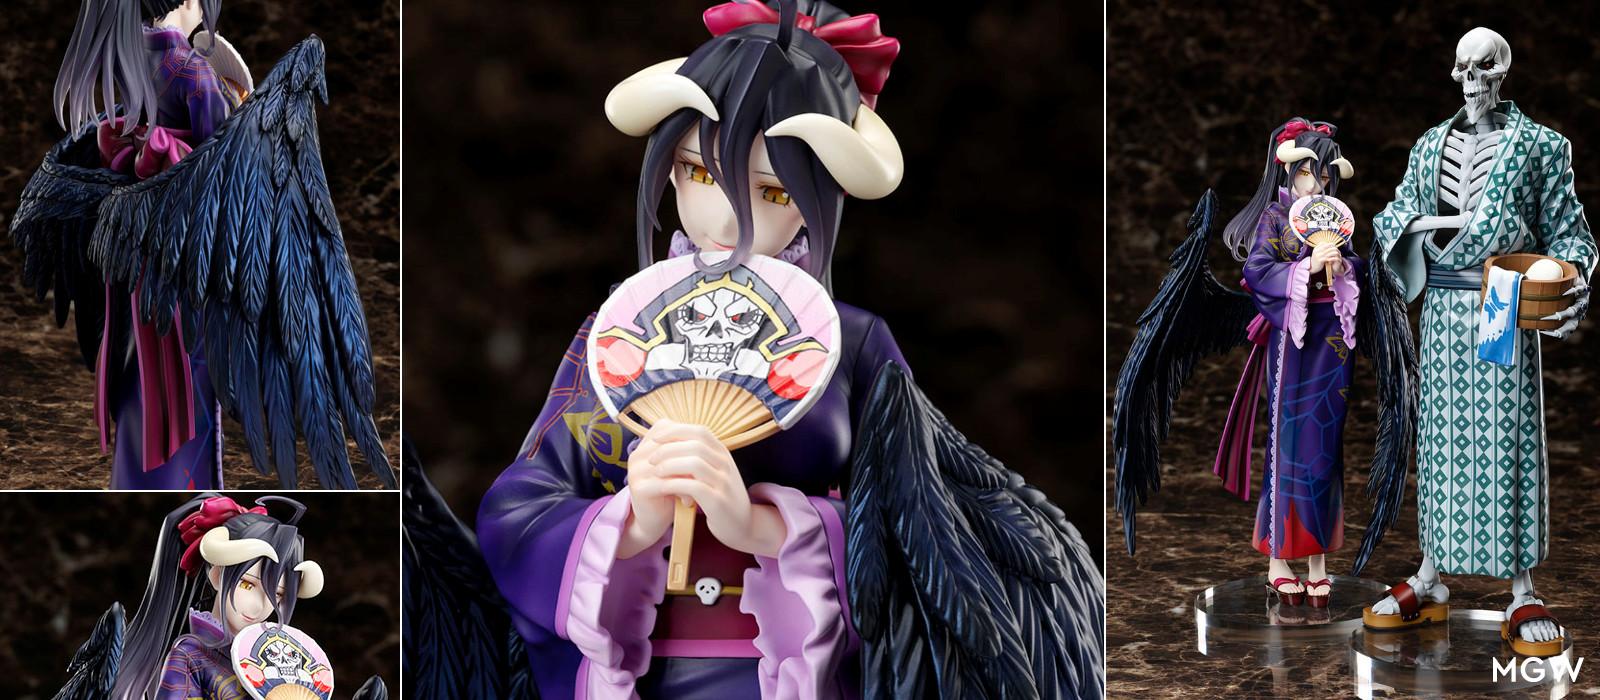 Albedo Yukata from Overlord by FuRyu